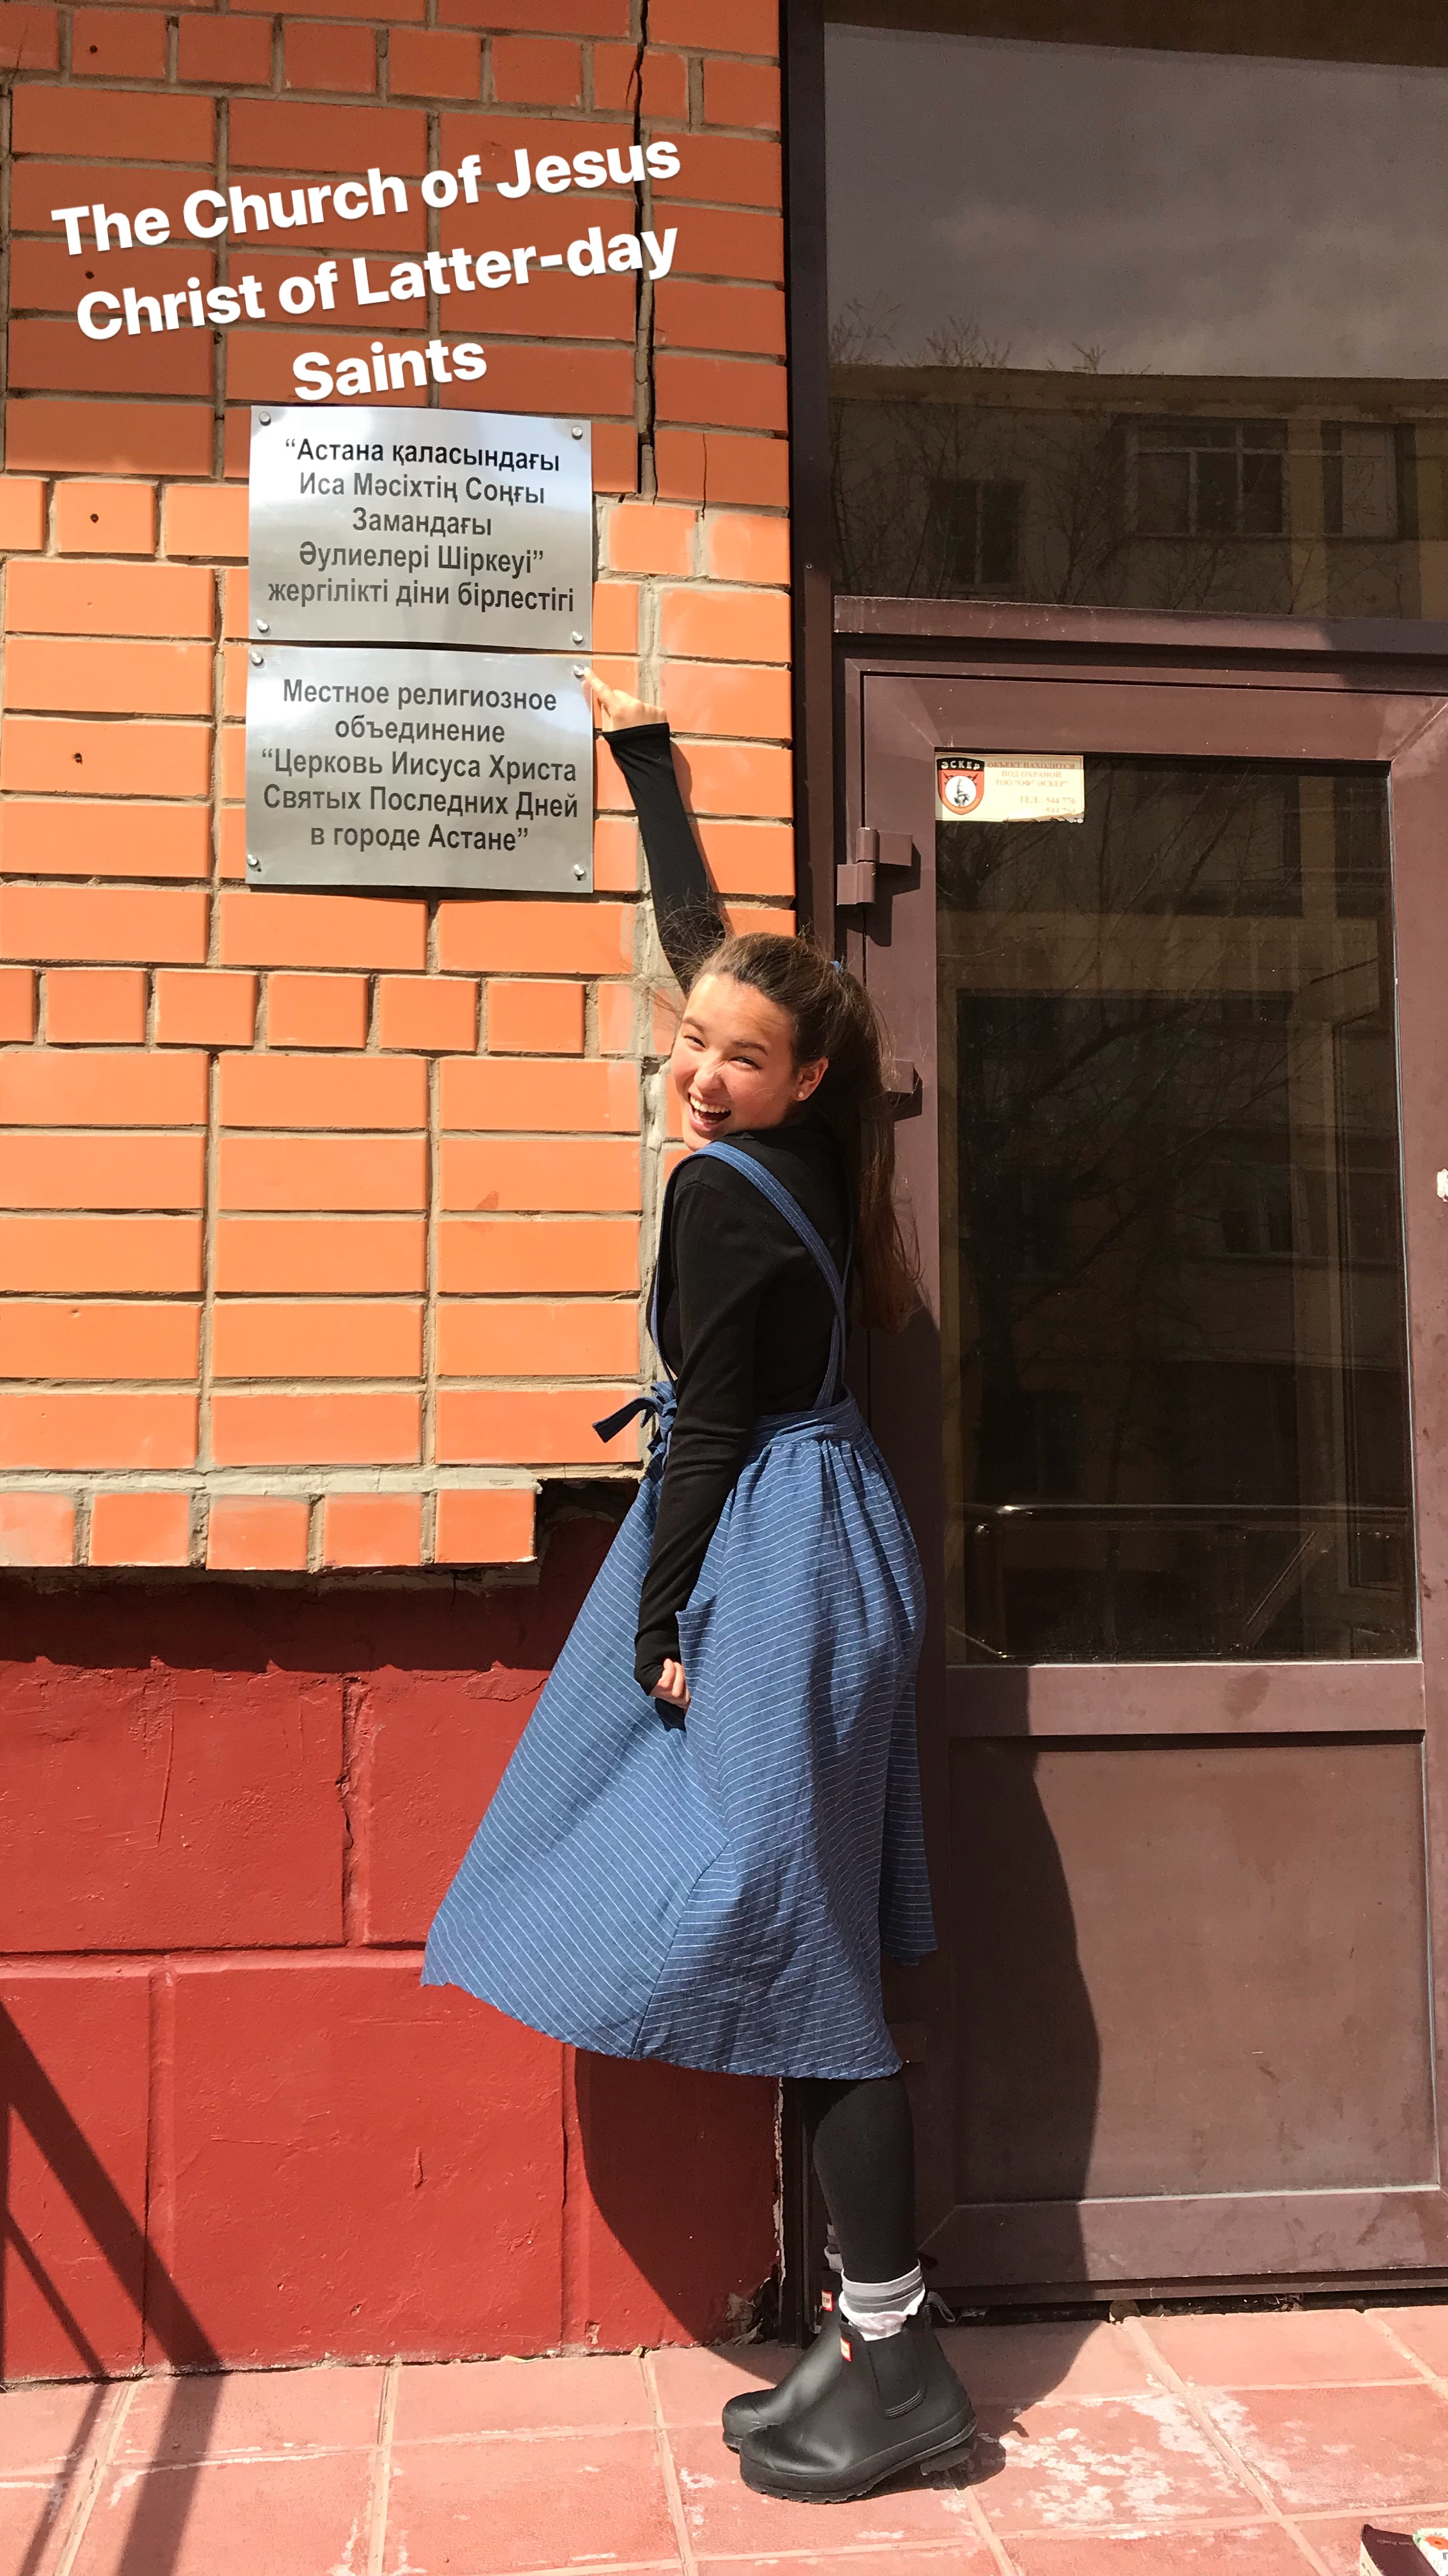 Church in Kazakhstan! The top sign is in Kazakh & bottom is in Russian